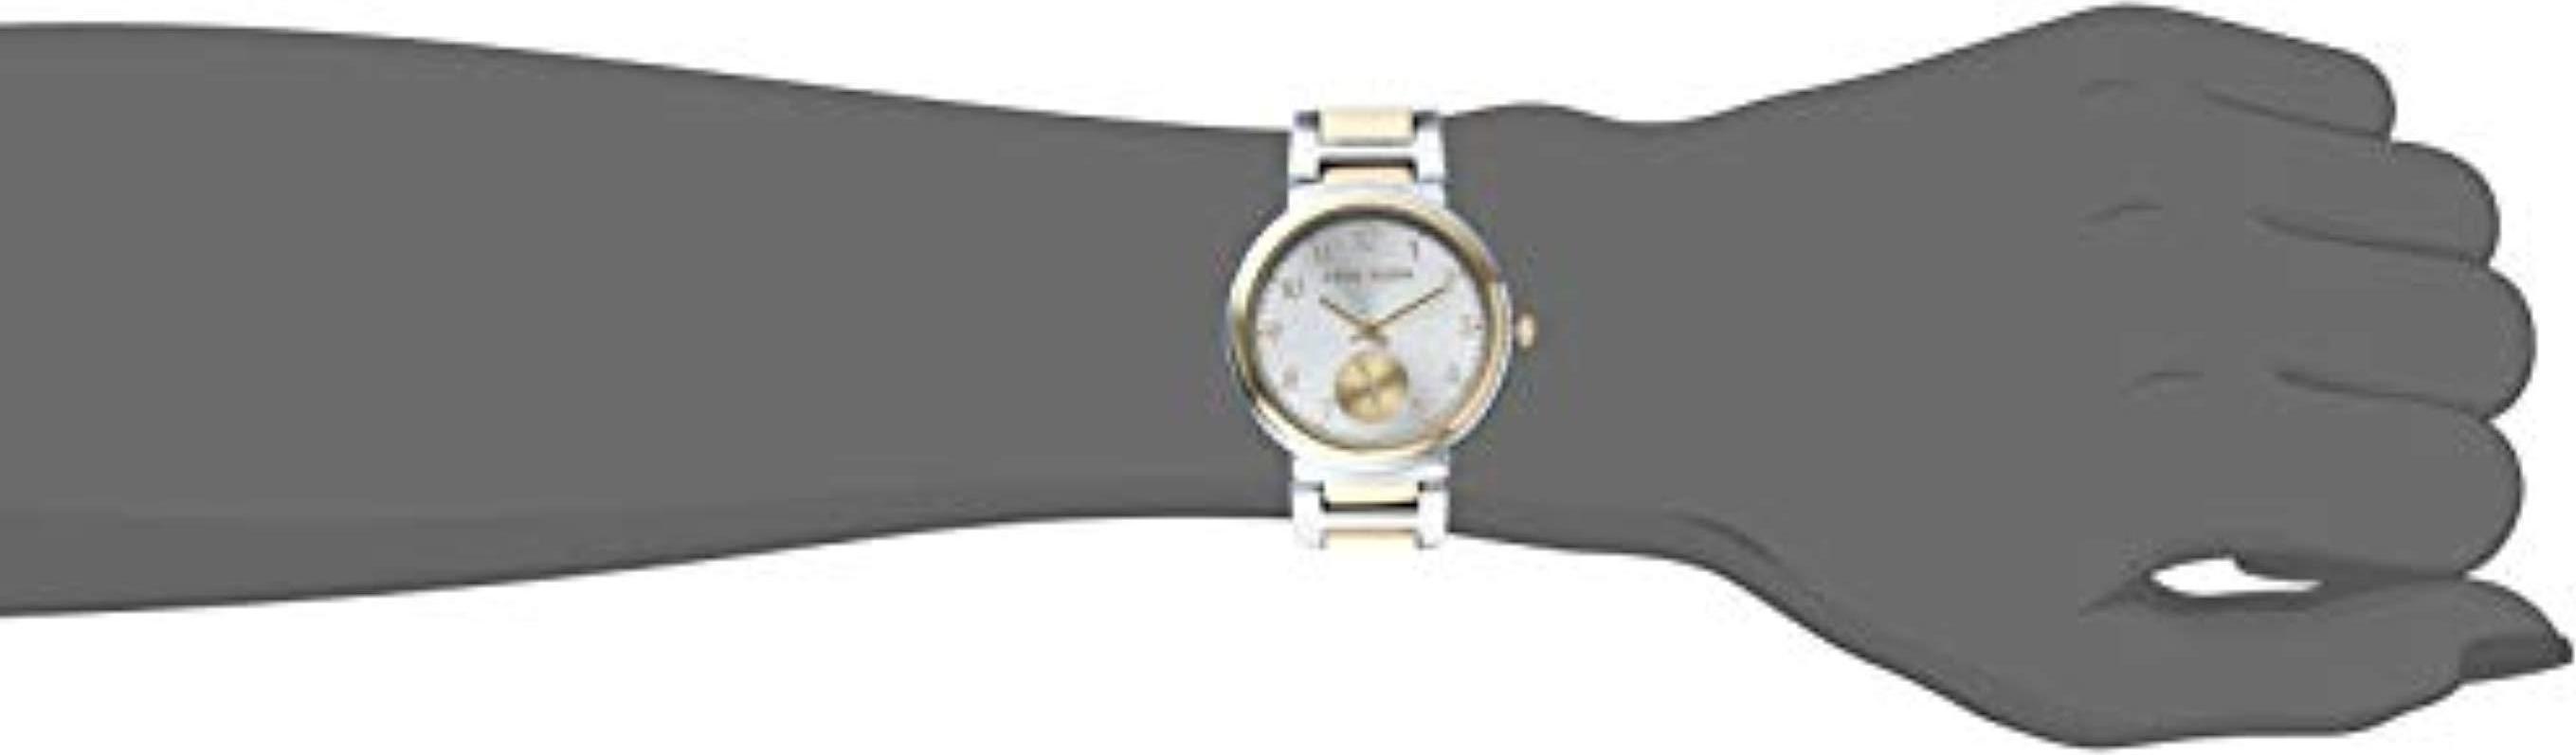 Đồng hồ thời trang nữ ANNE KLEIN 3407SVTT